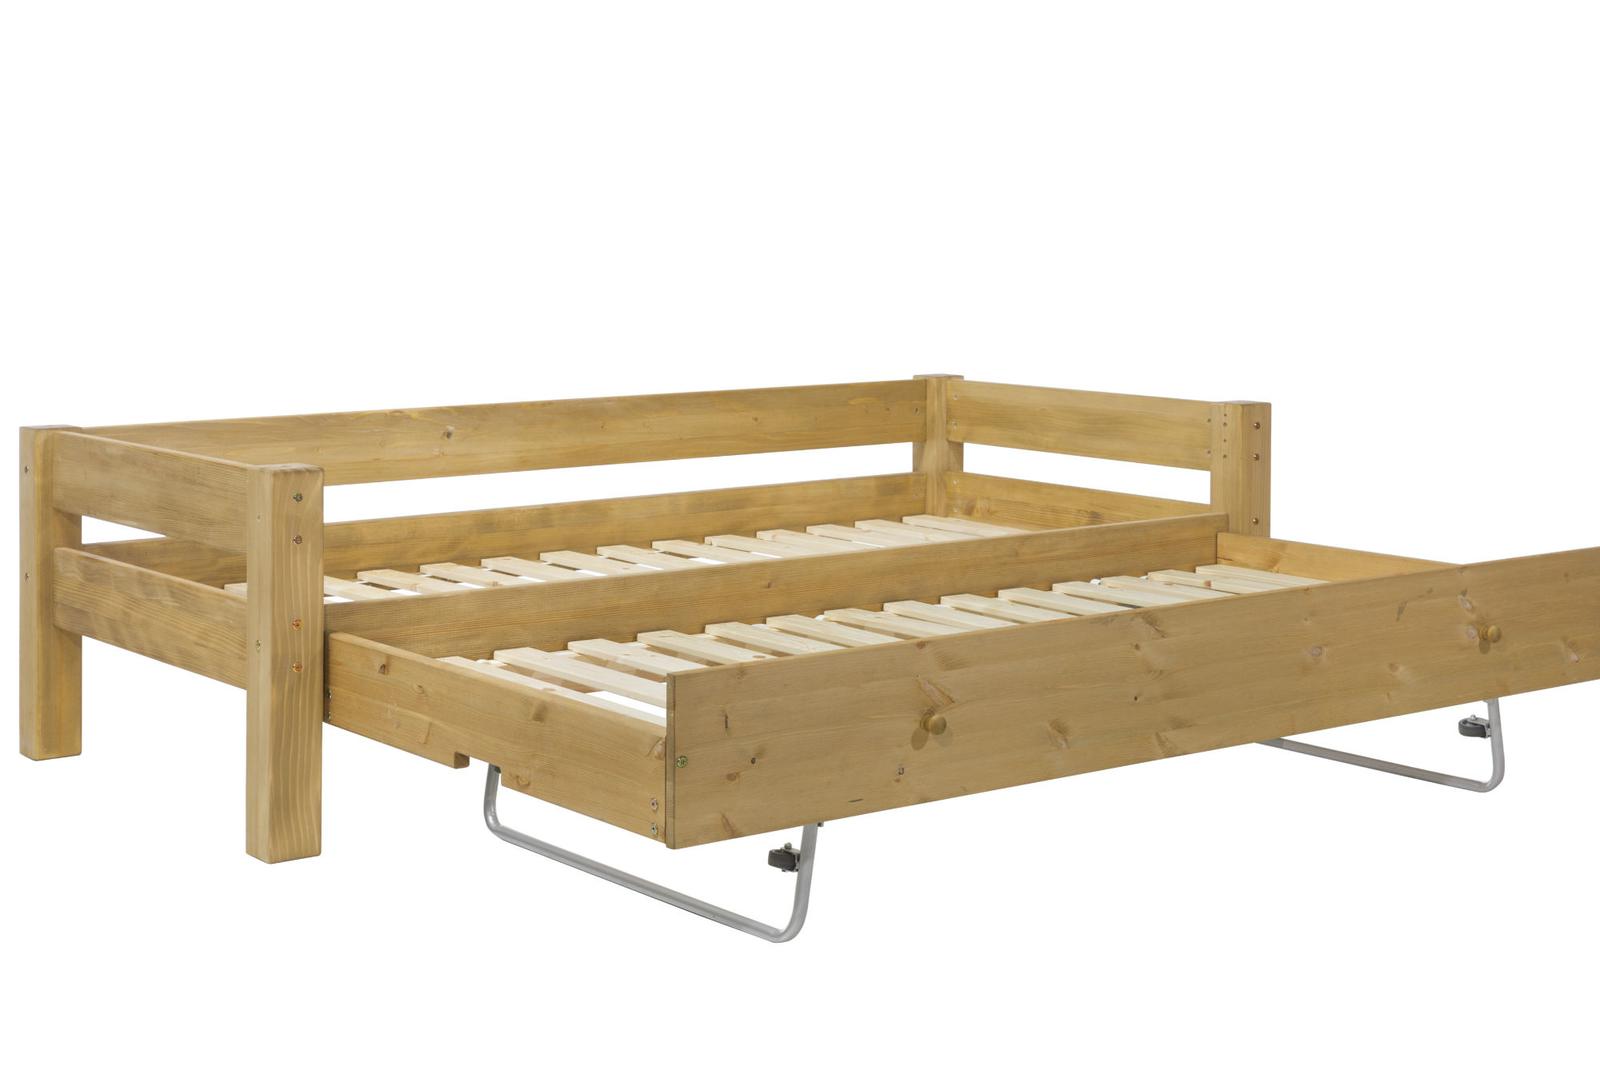 Etagenbett Pauli : Kinderbett massiv etagenbett pauli buche vollholz